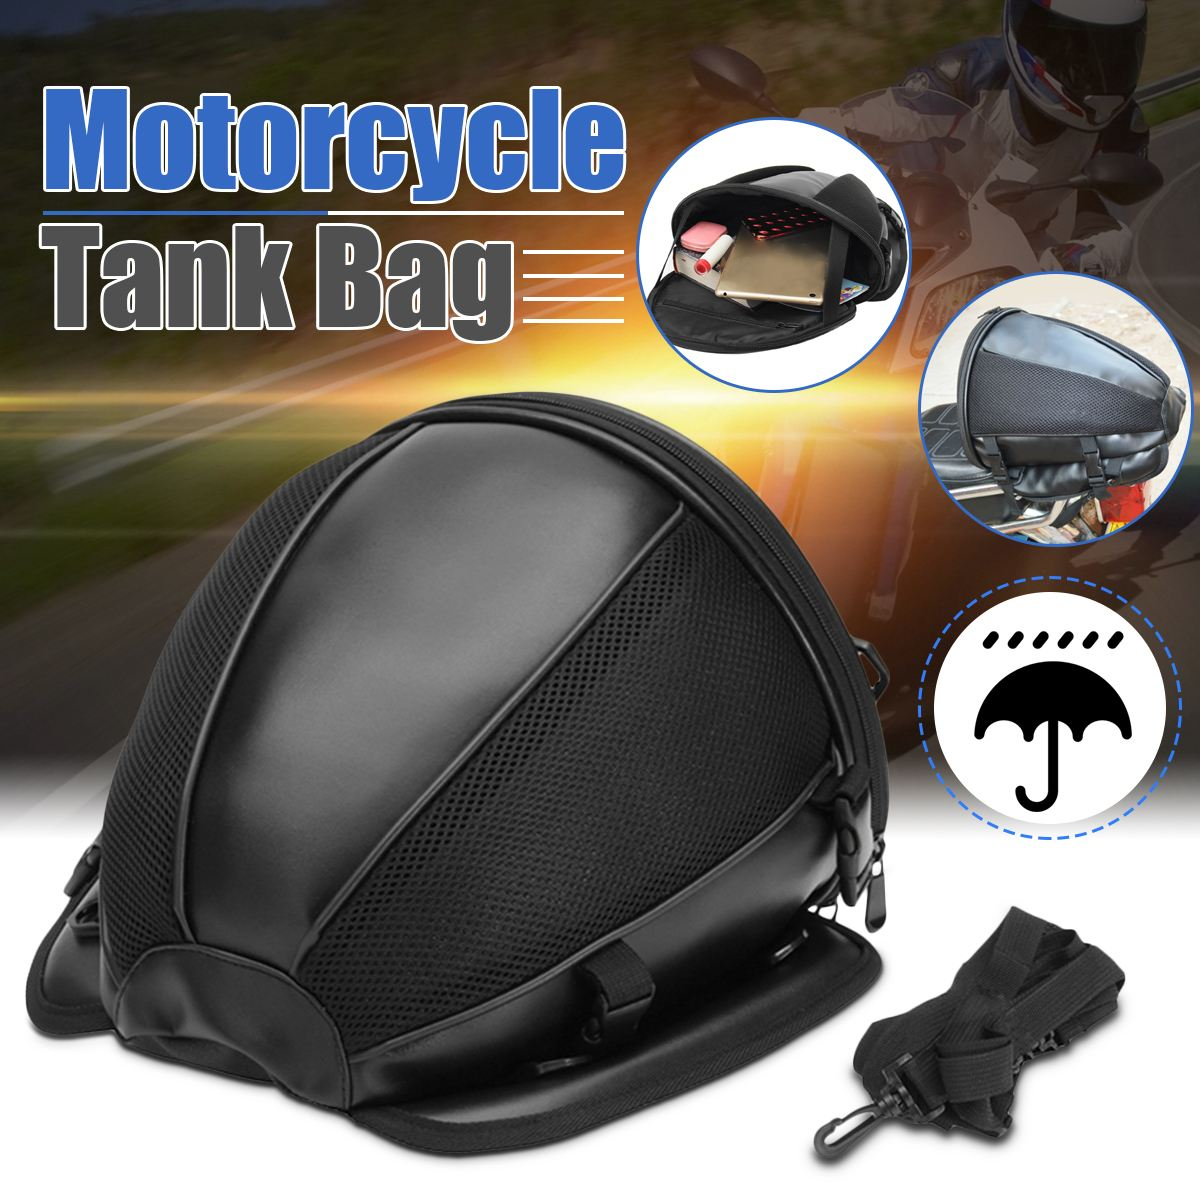 Mofaner, bolsa de tanque de aceite para motocicleta, herramienta impermeable, equipaje, equitación, tribu, viaje, motocicleta, Scooter, bolsas de cola